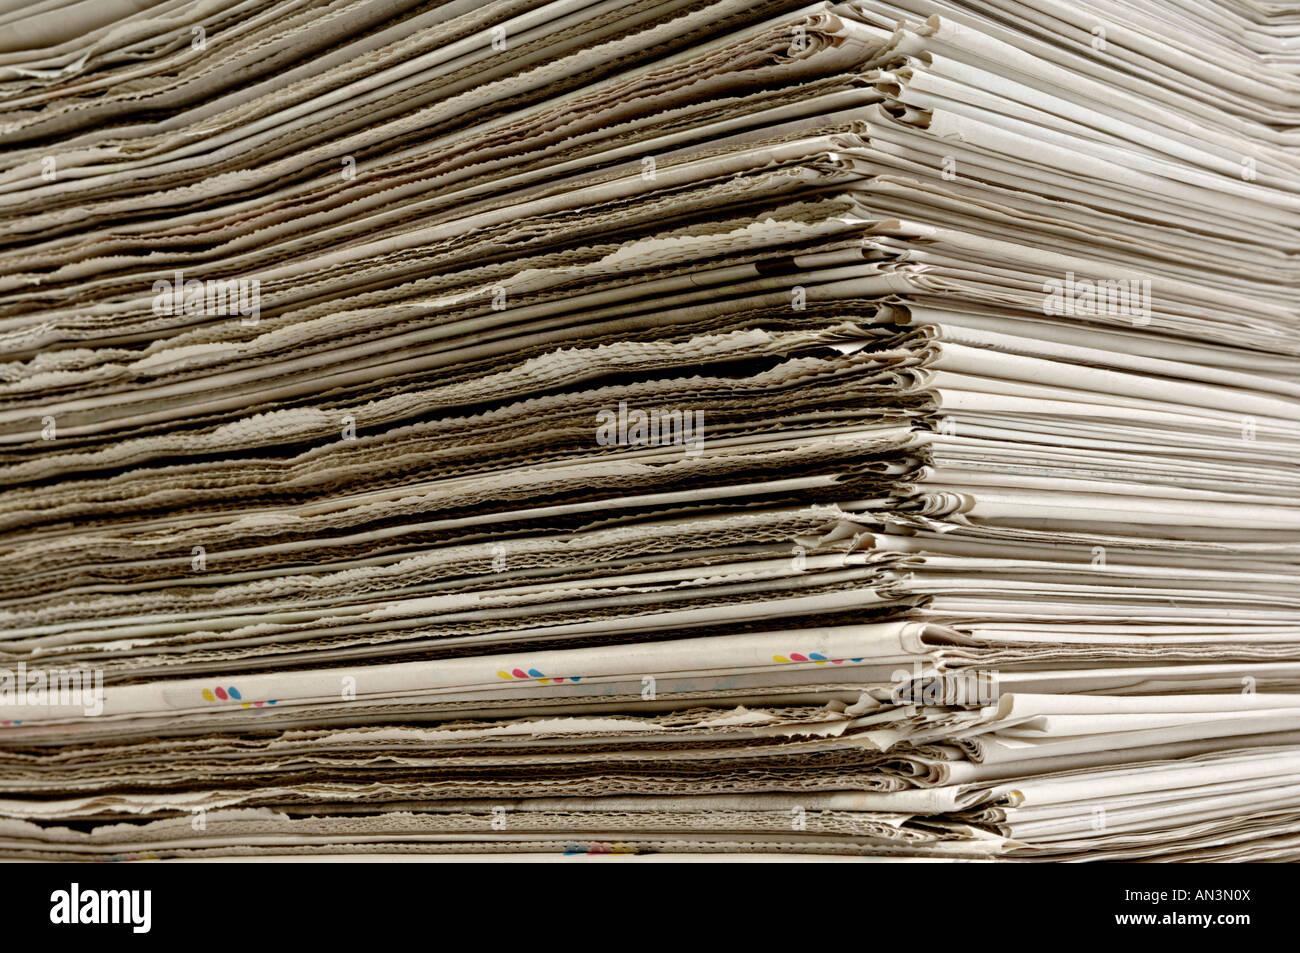 Pila de periódicos Imagen De Stock